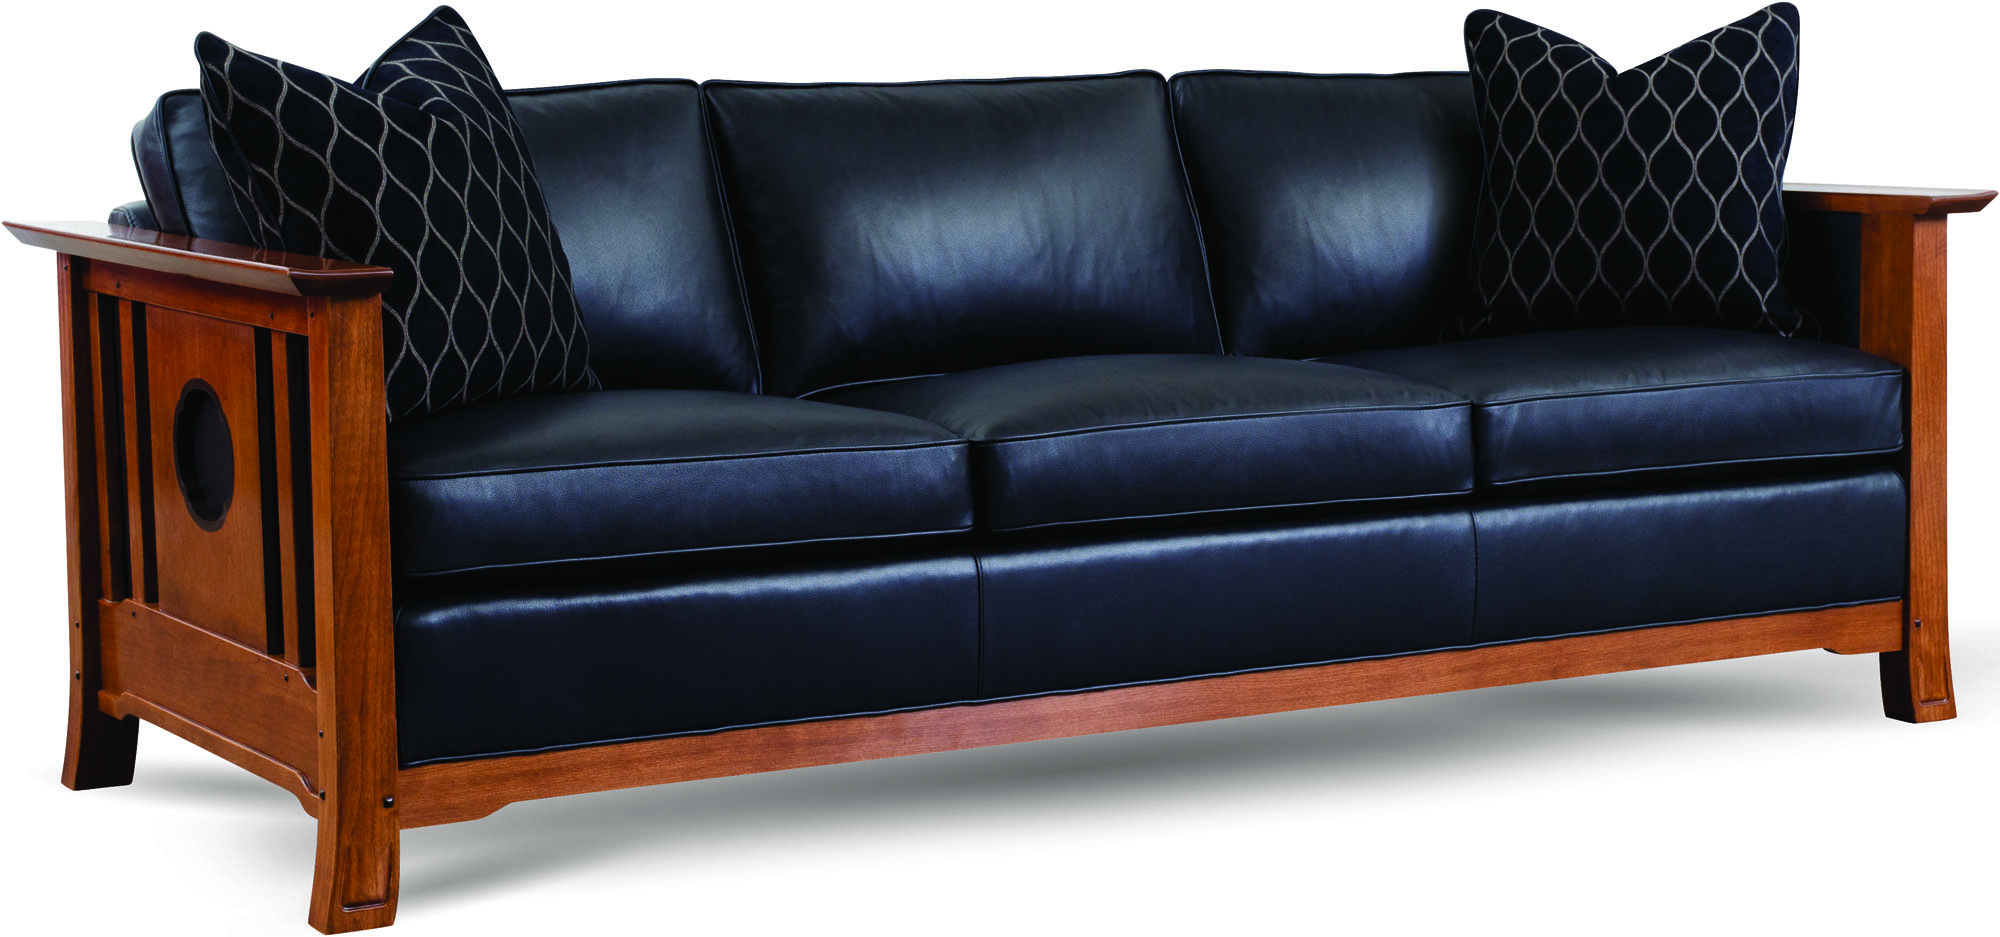 Oak Knoll sofa from Stickley